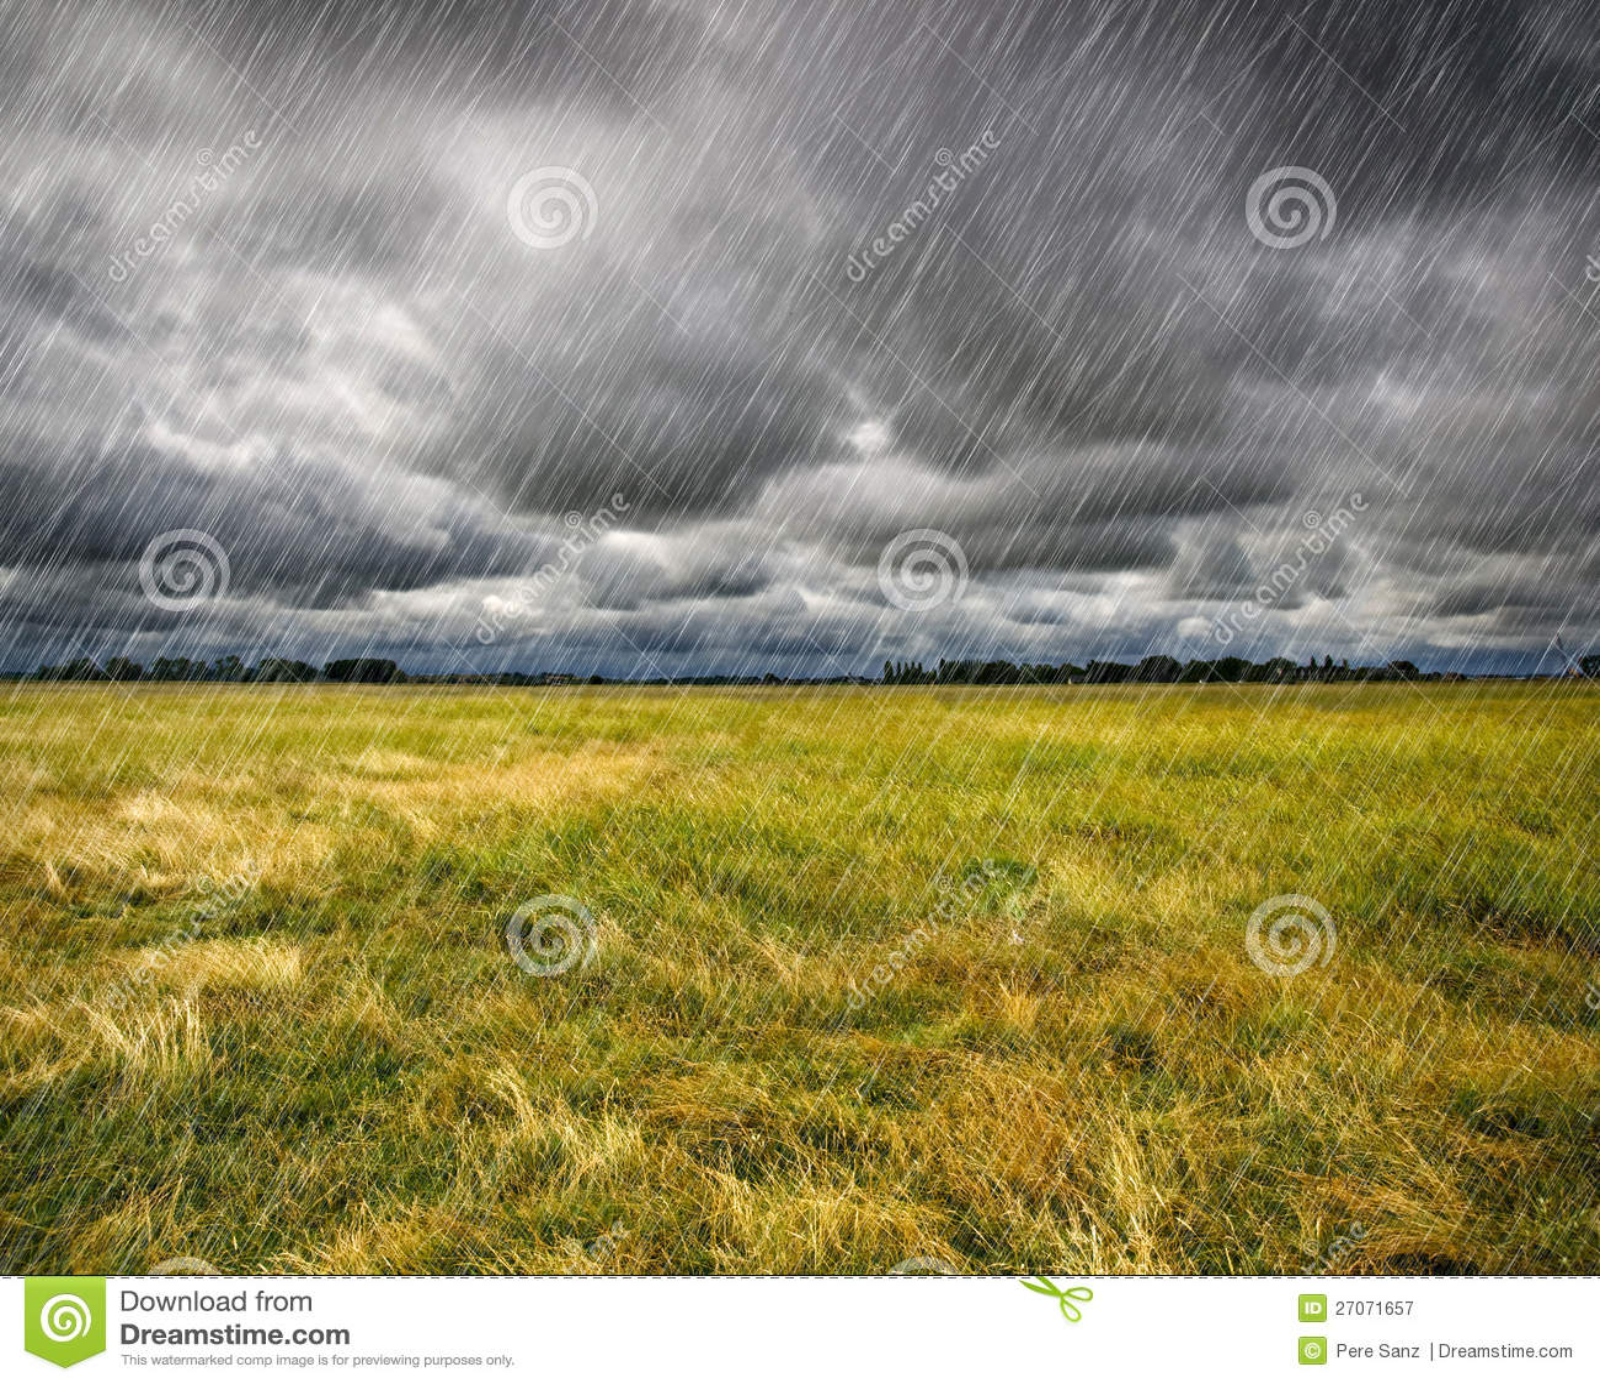 Tungt regn över en prärie